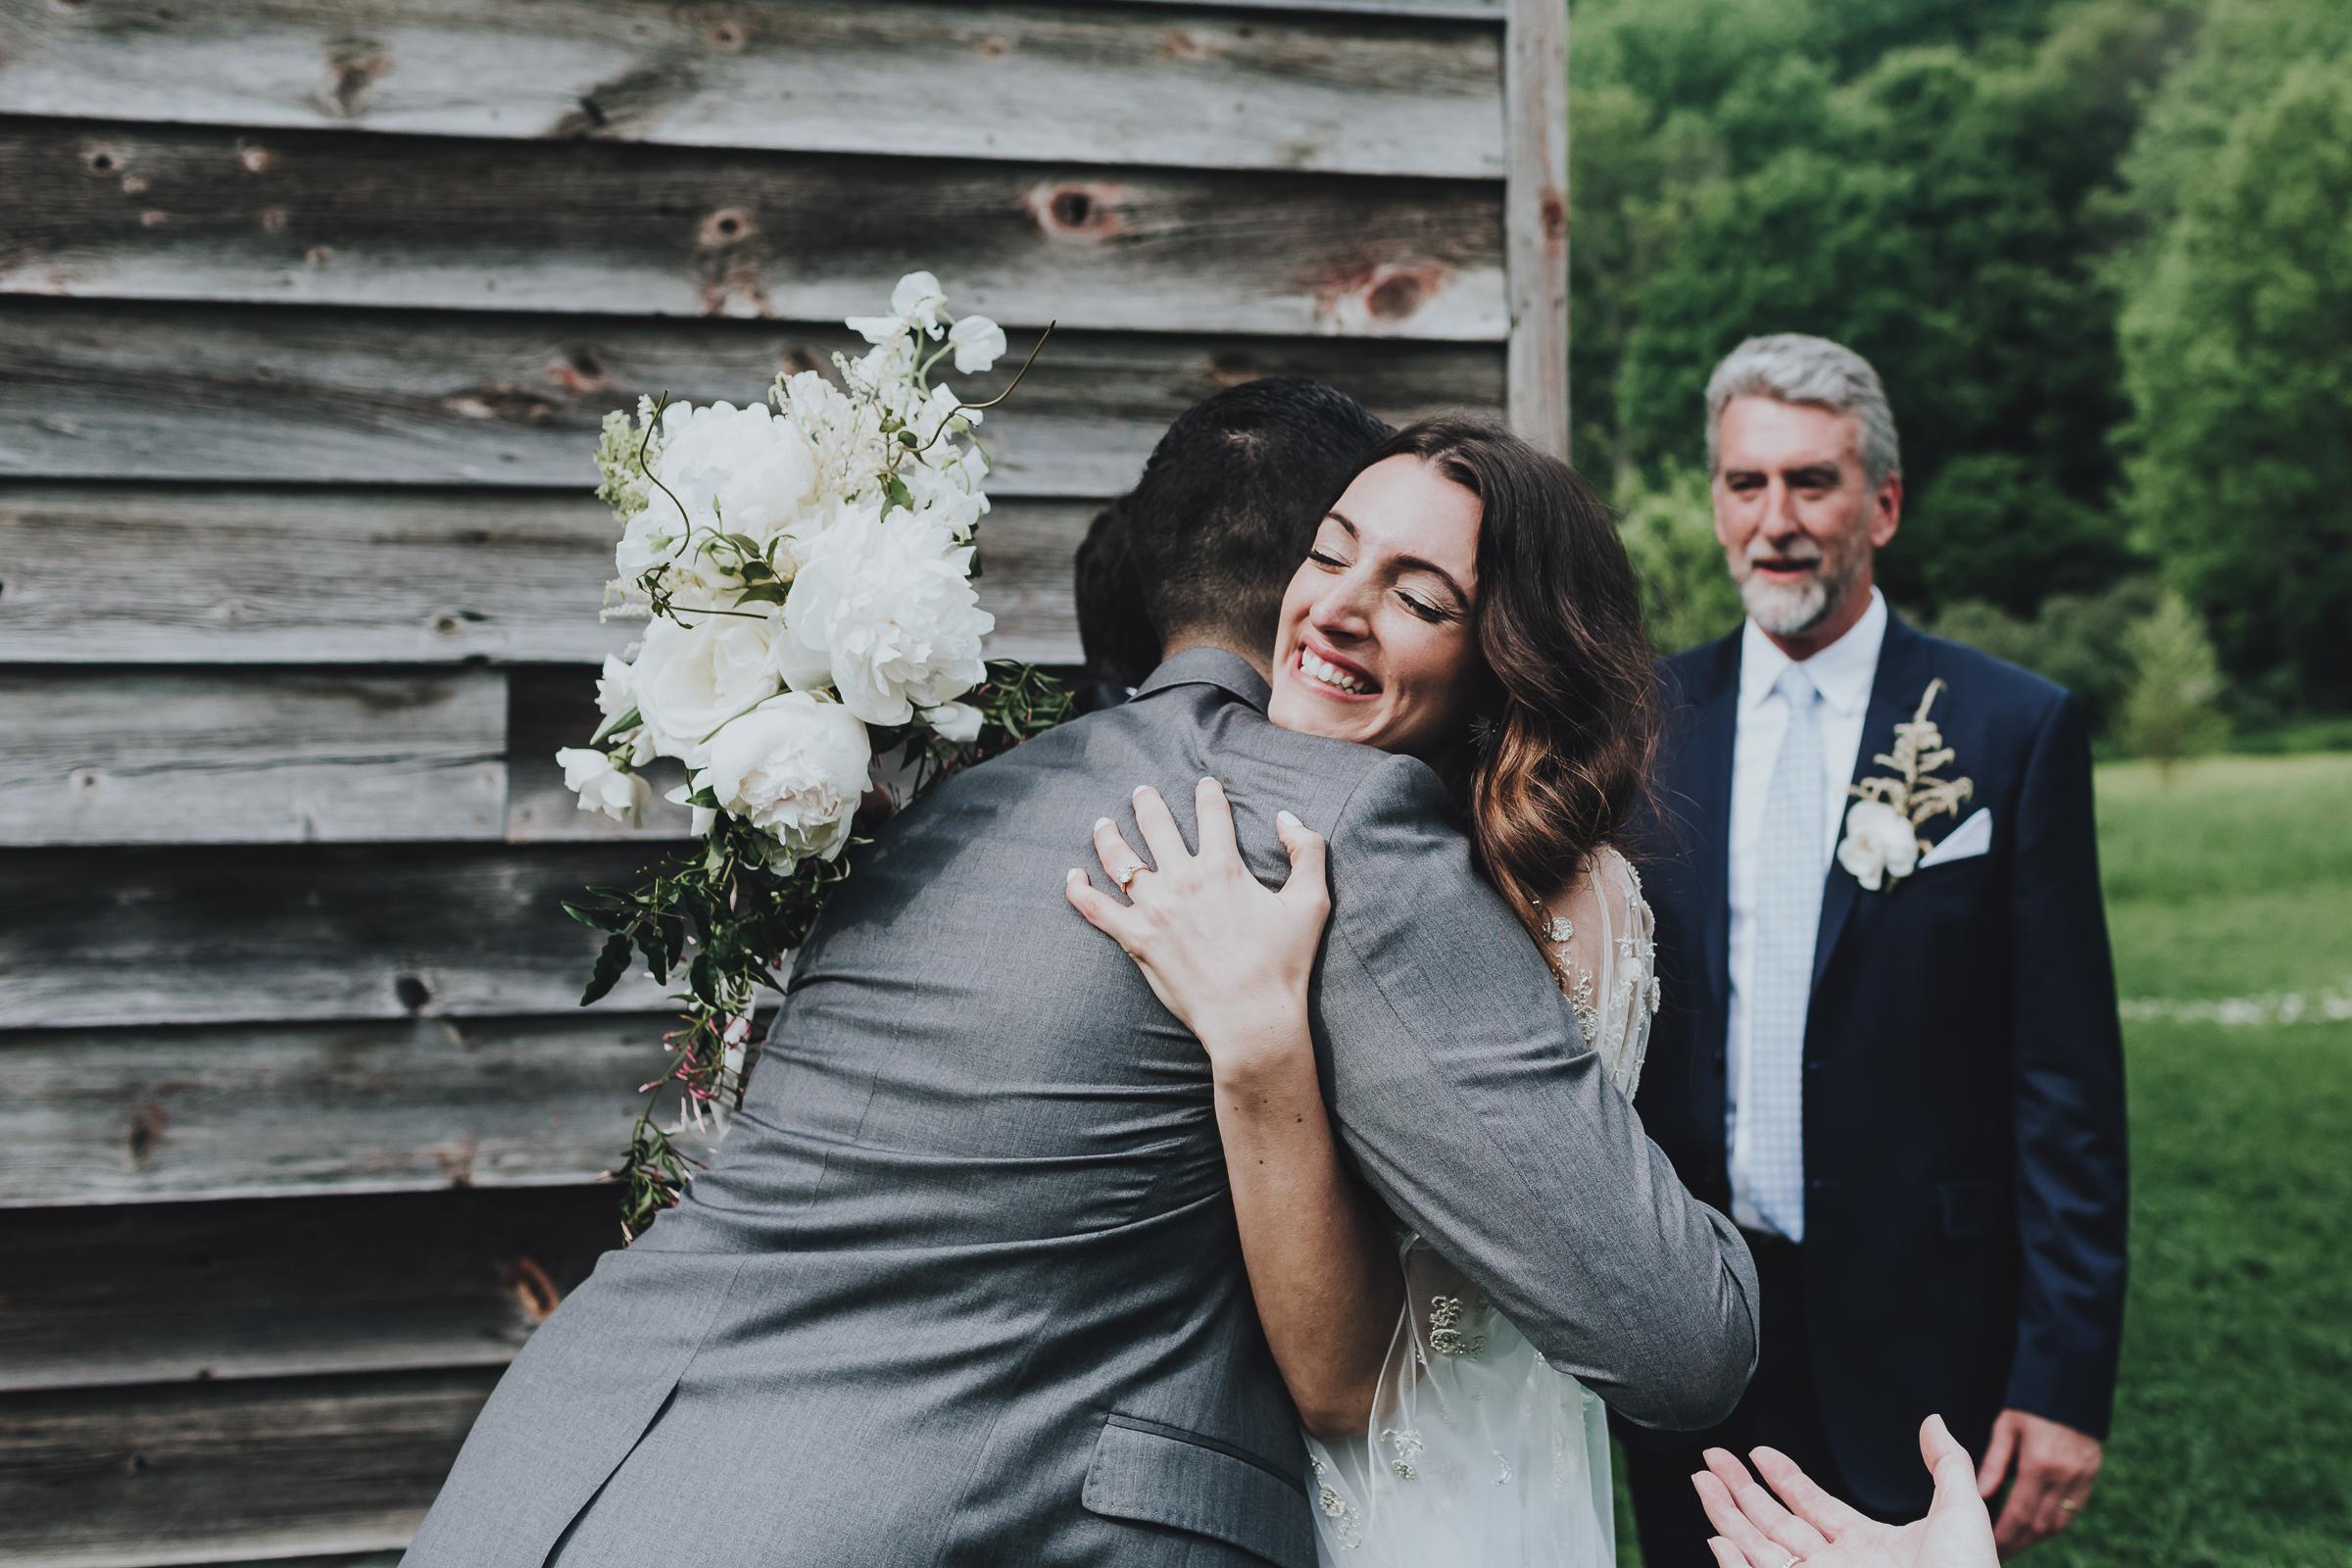 Handsome-Hollow-Long-Eddy-Catskills-New-York-Fine-Art-Documentary-Wedding-Photographer-77.jpg